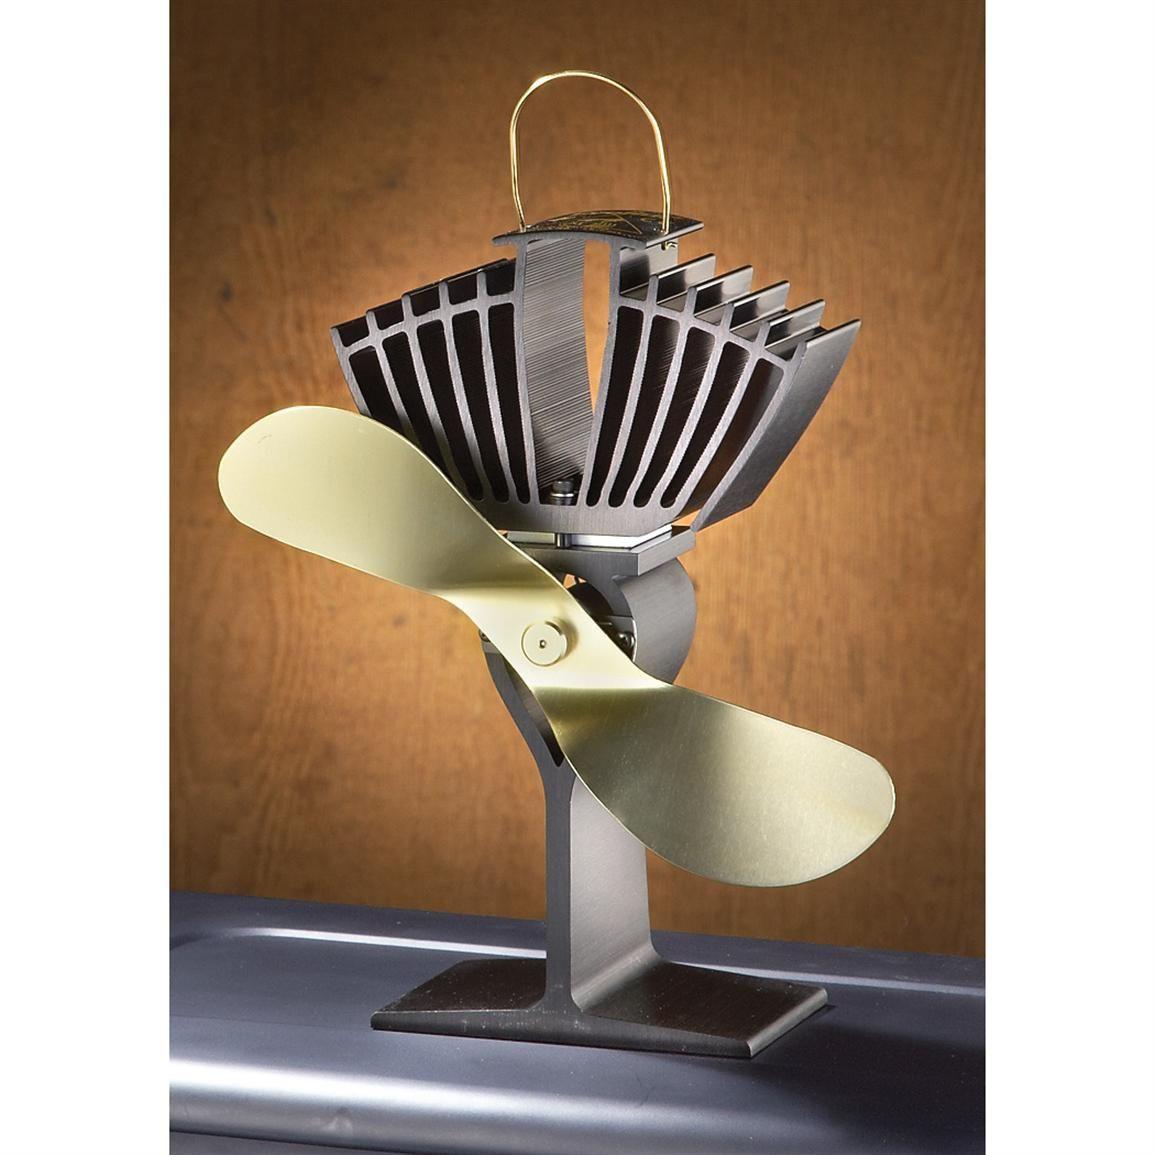 Ecofan Heat Powered Wood Stove Fan 216268 Accessories At Sportsman S Guide Wood Burning Stove Wood Stove Wood Heat